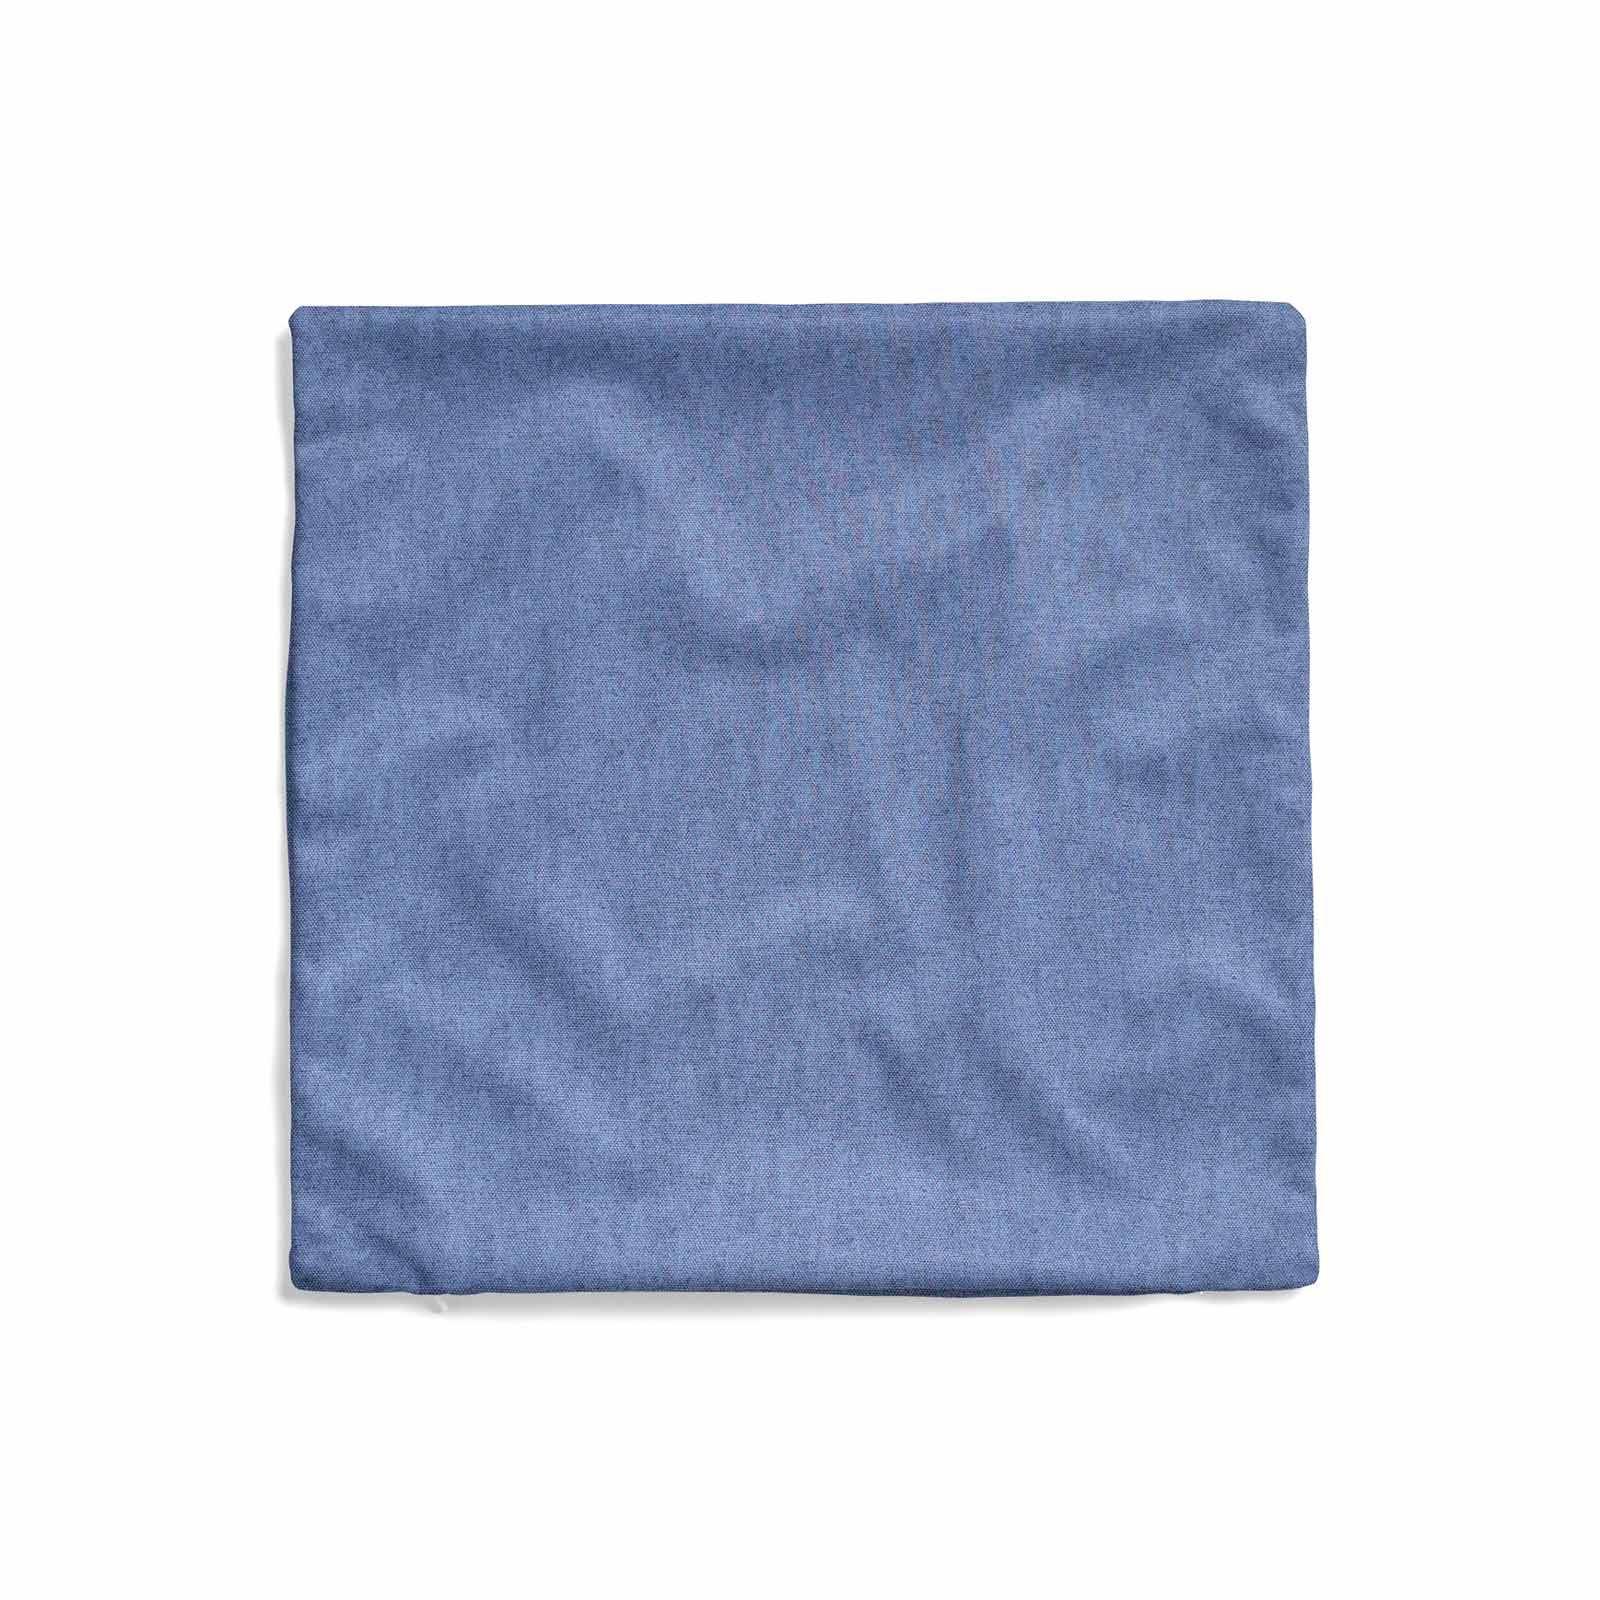 Crema-Color-Foglia-Di-Te-Blu-Uovo-D-039-anatra-Cuscino-Copre-18-034-x-18-034-45-CM-x-45-cm-COVER miniatura 48